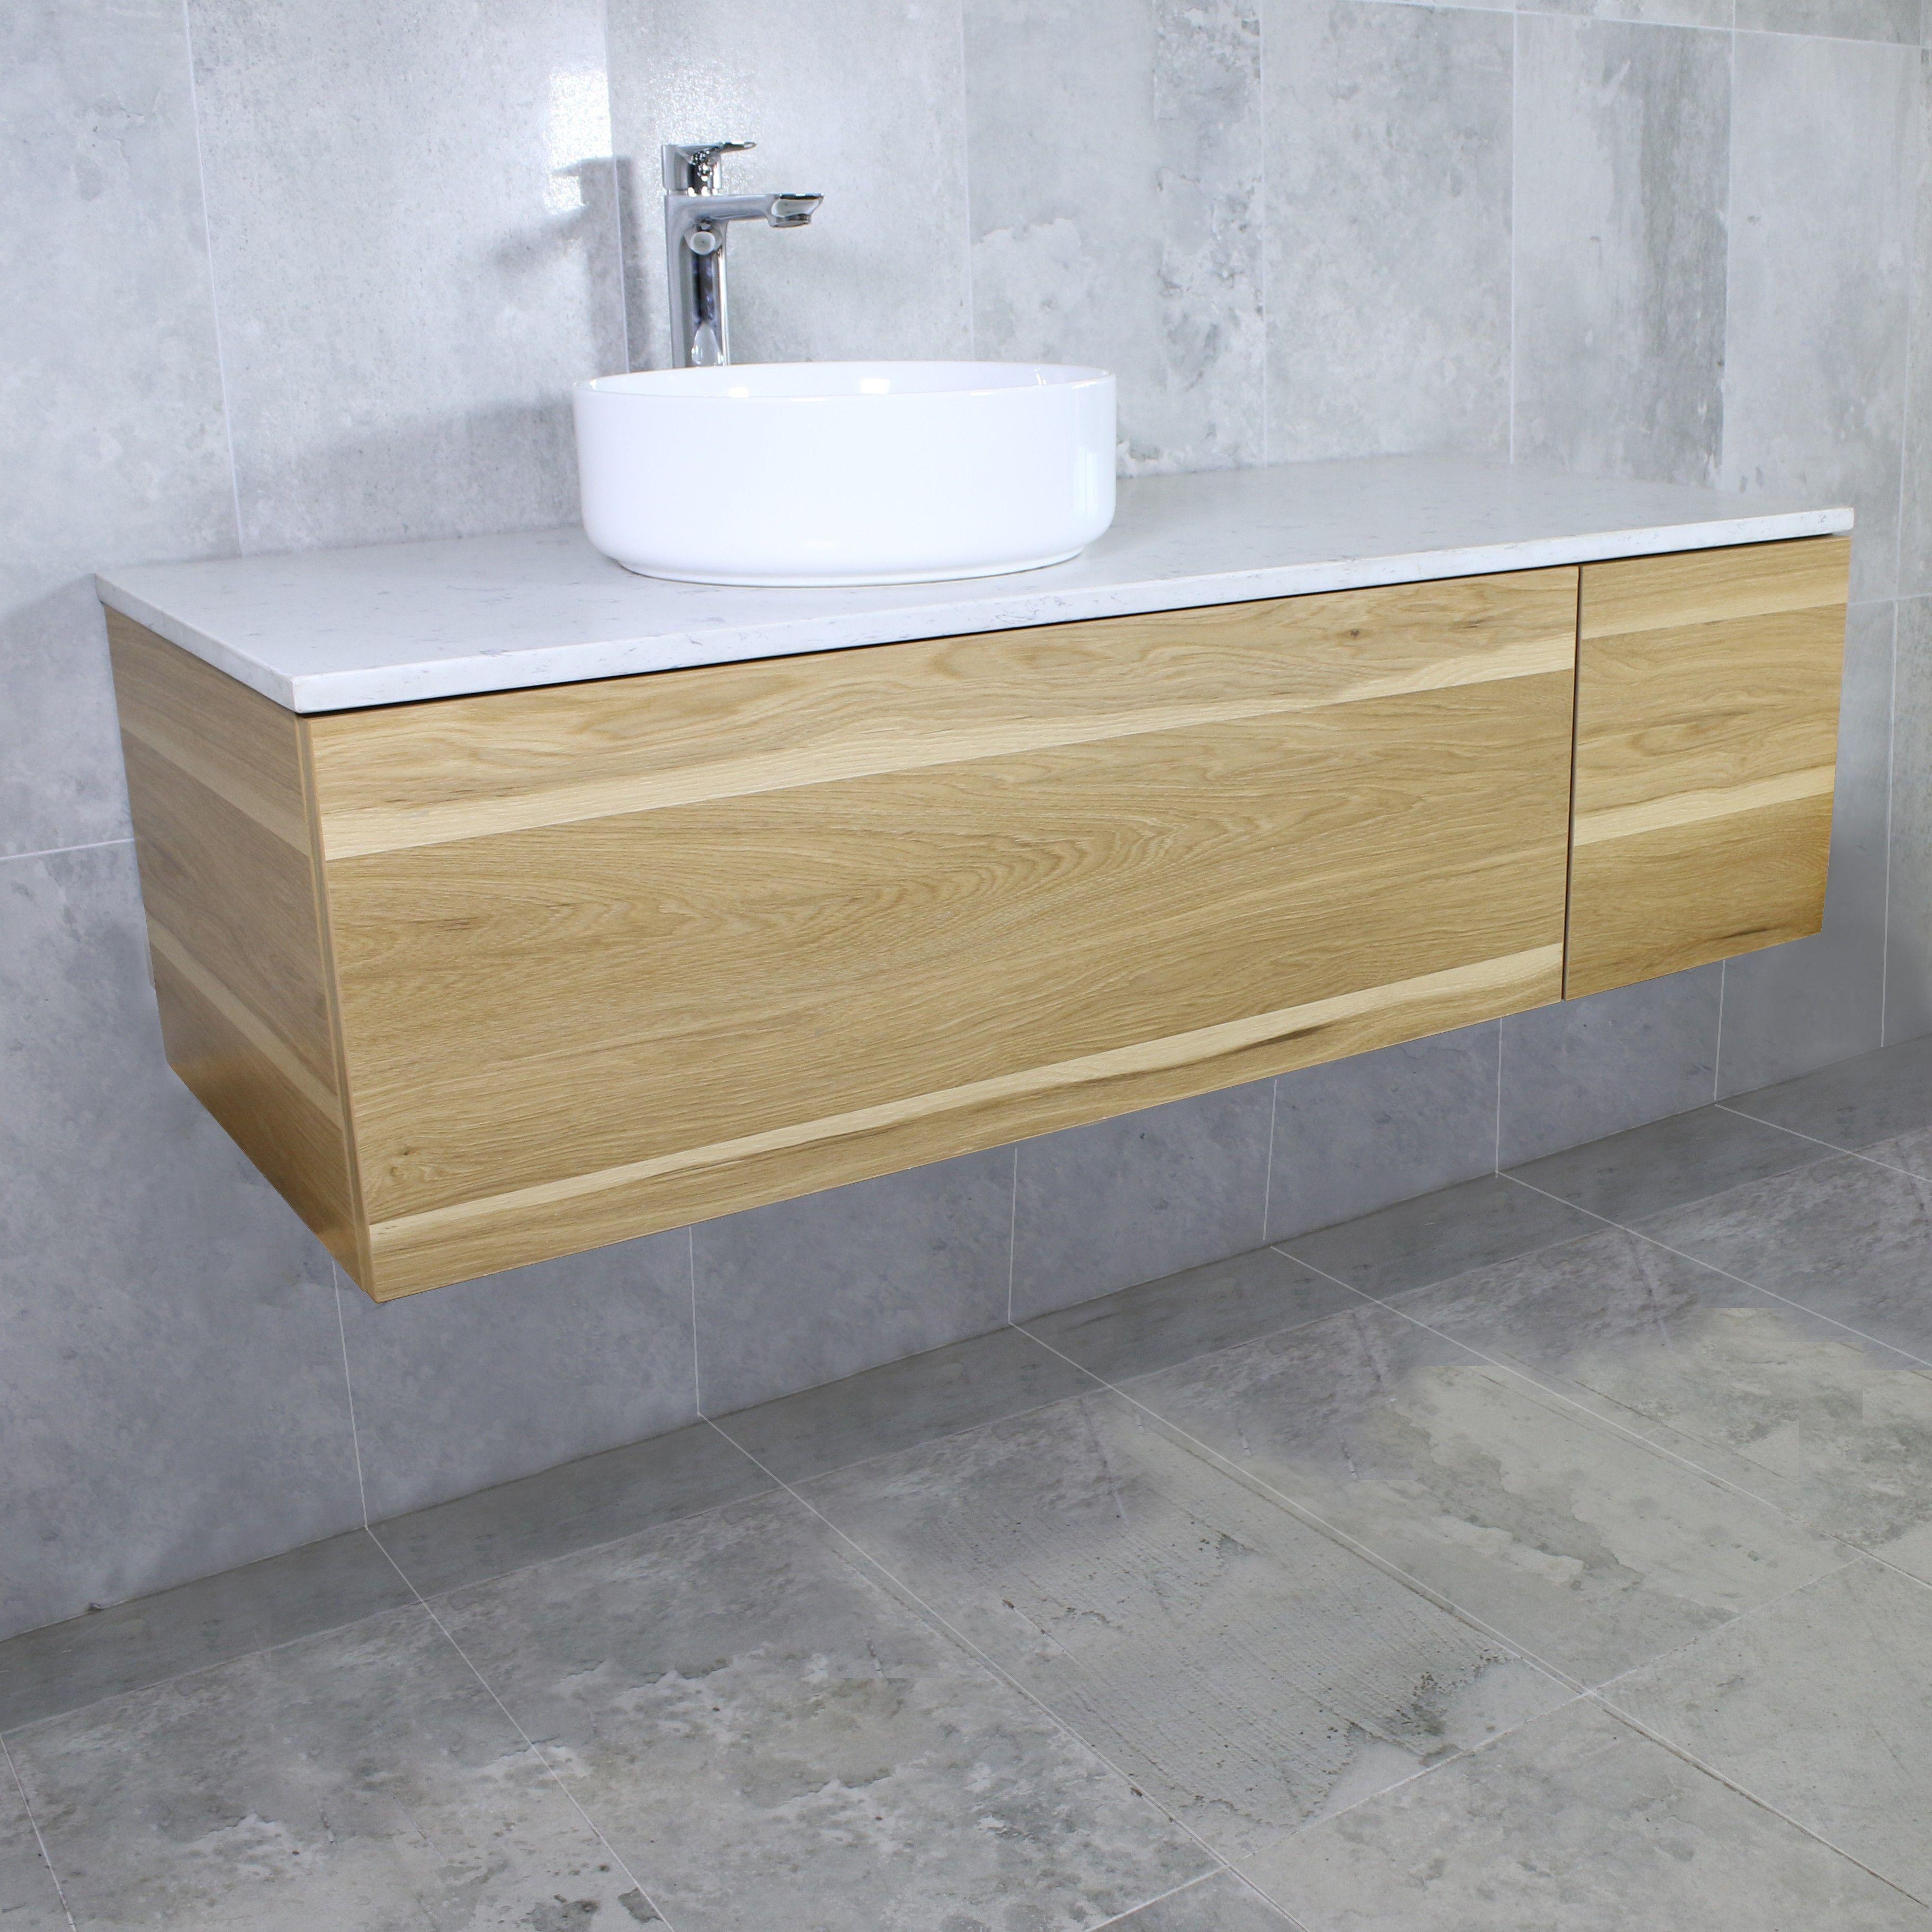 Clearance Bathroom Vanities Liberty Interior Cheap Bathroom From Discounted Bathroom Cabinets